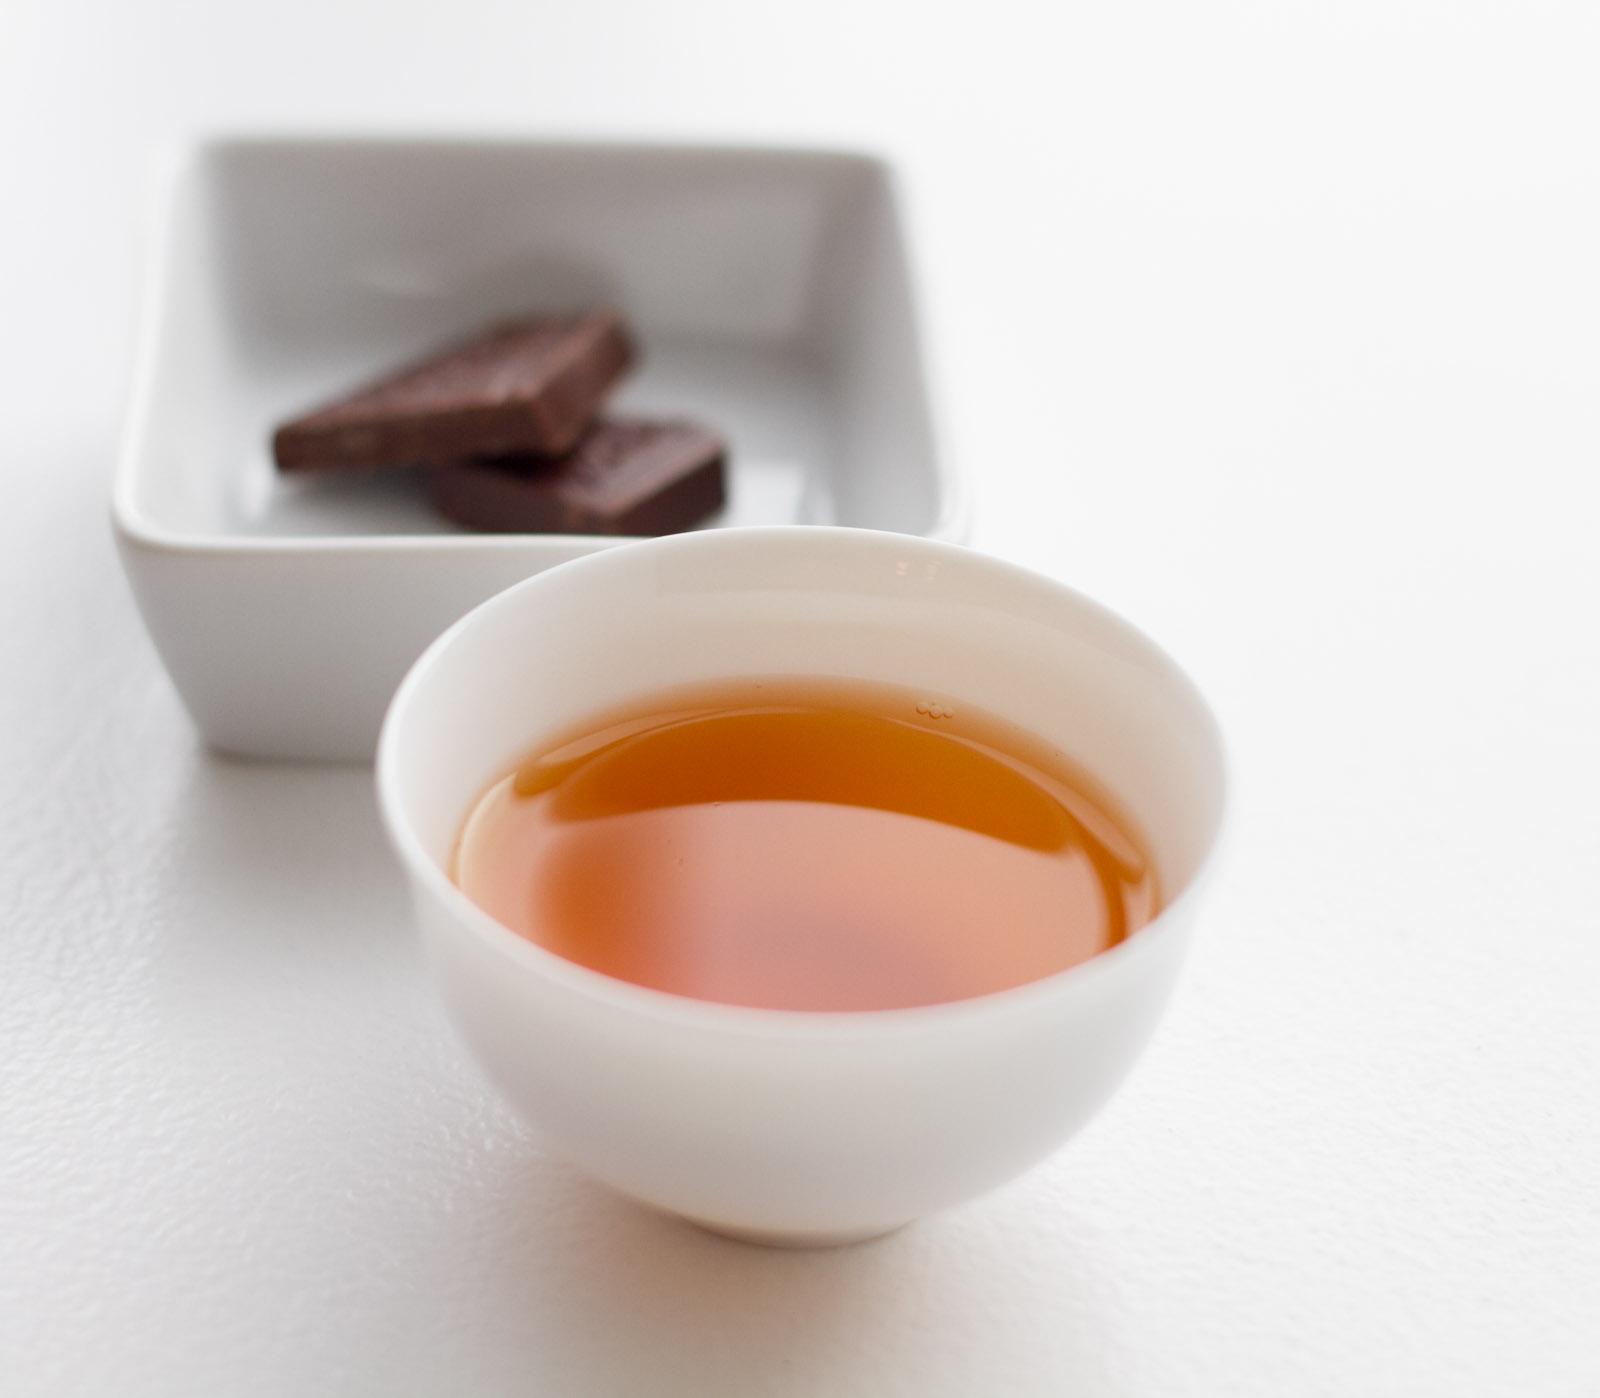 Black Fragrance rare paired with 72% single estate dark chocolate